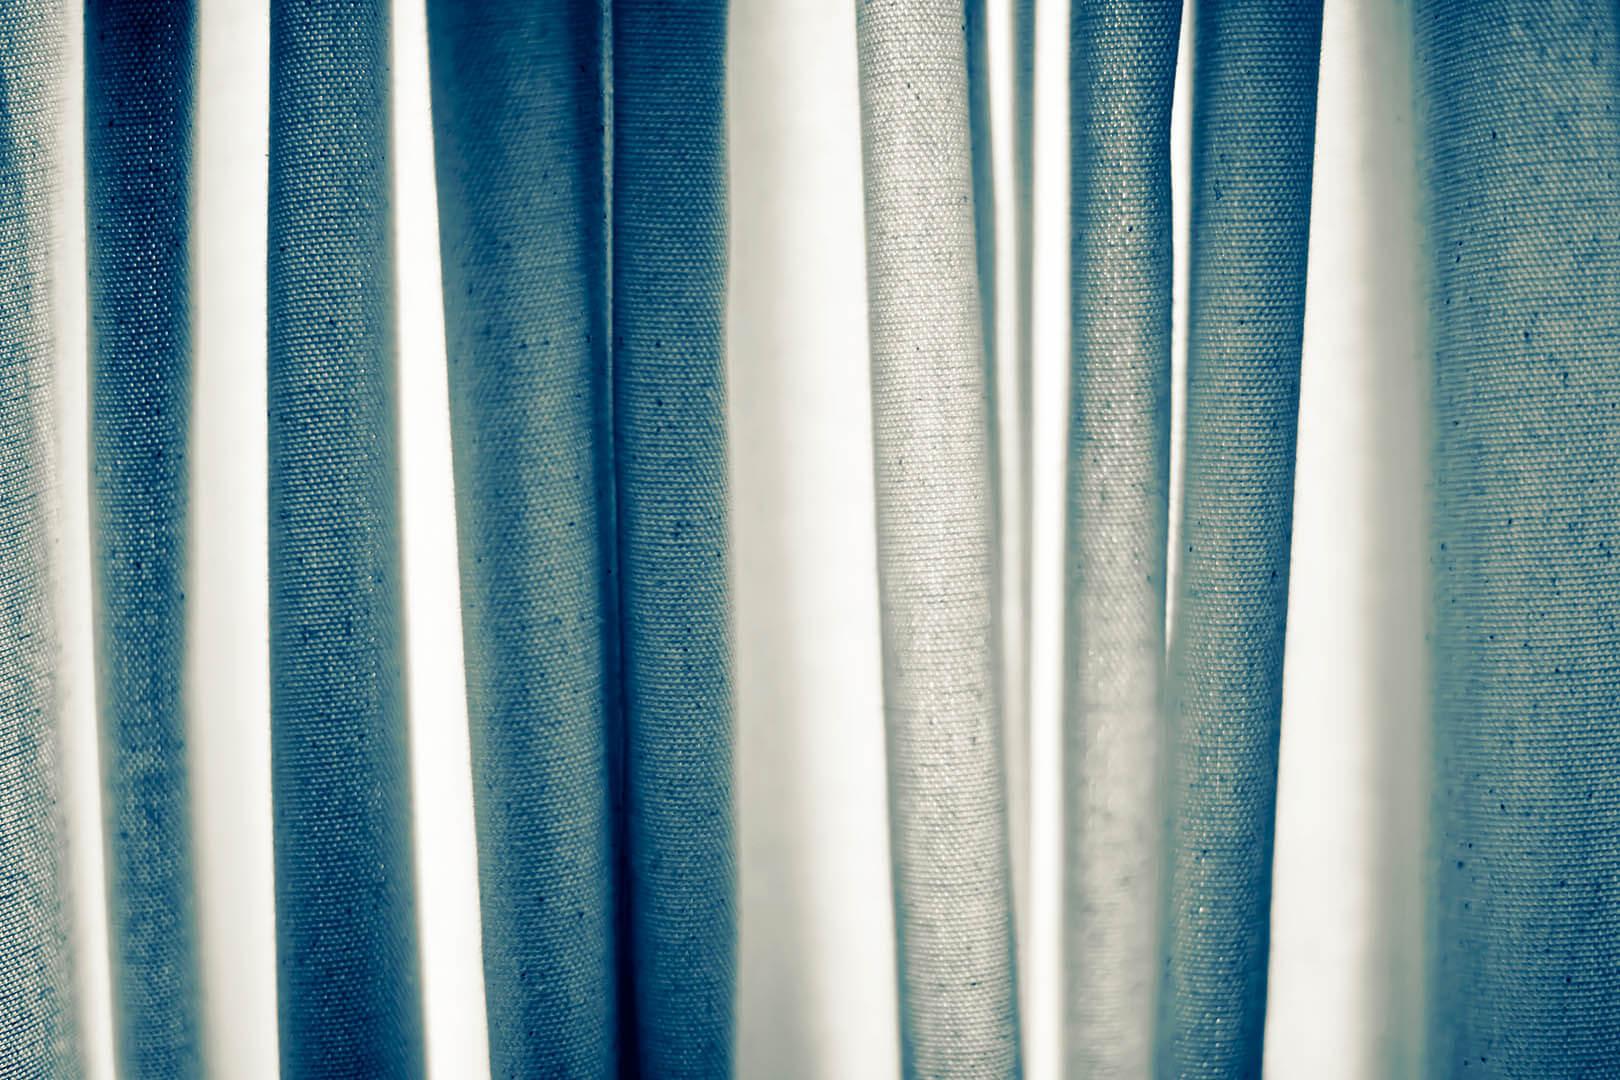 Curtains #1